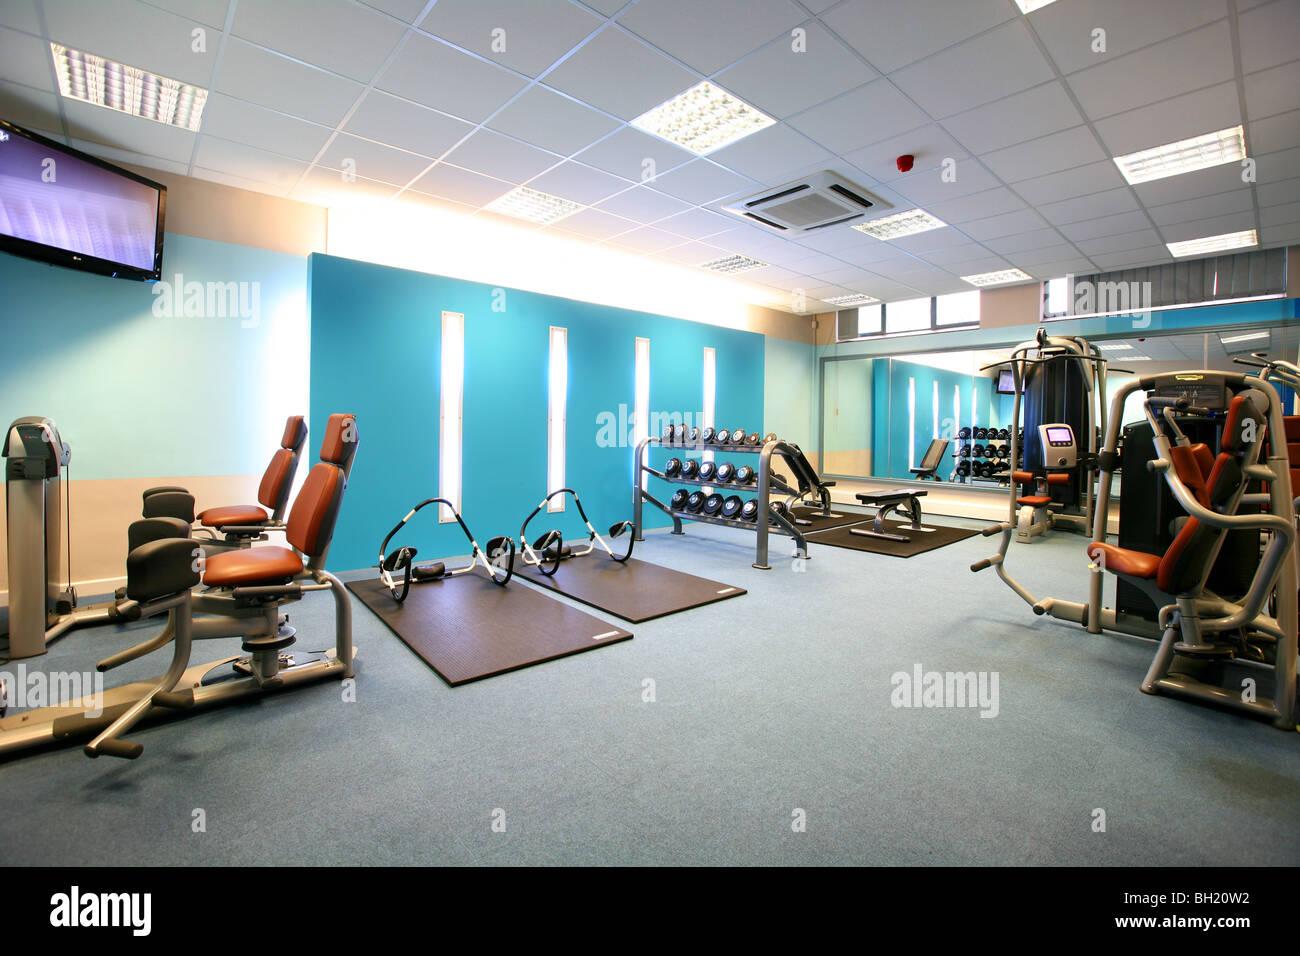 Moderno gimnasio equipado con diversos aparatos de ejercicios Imagen De Stock